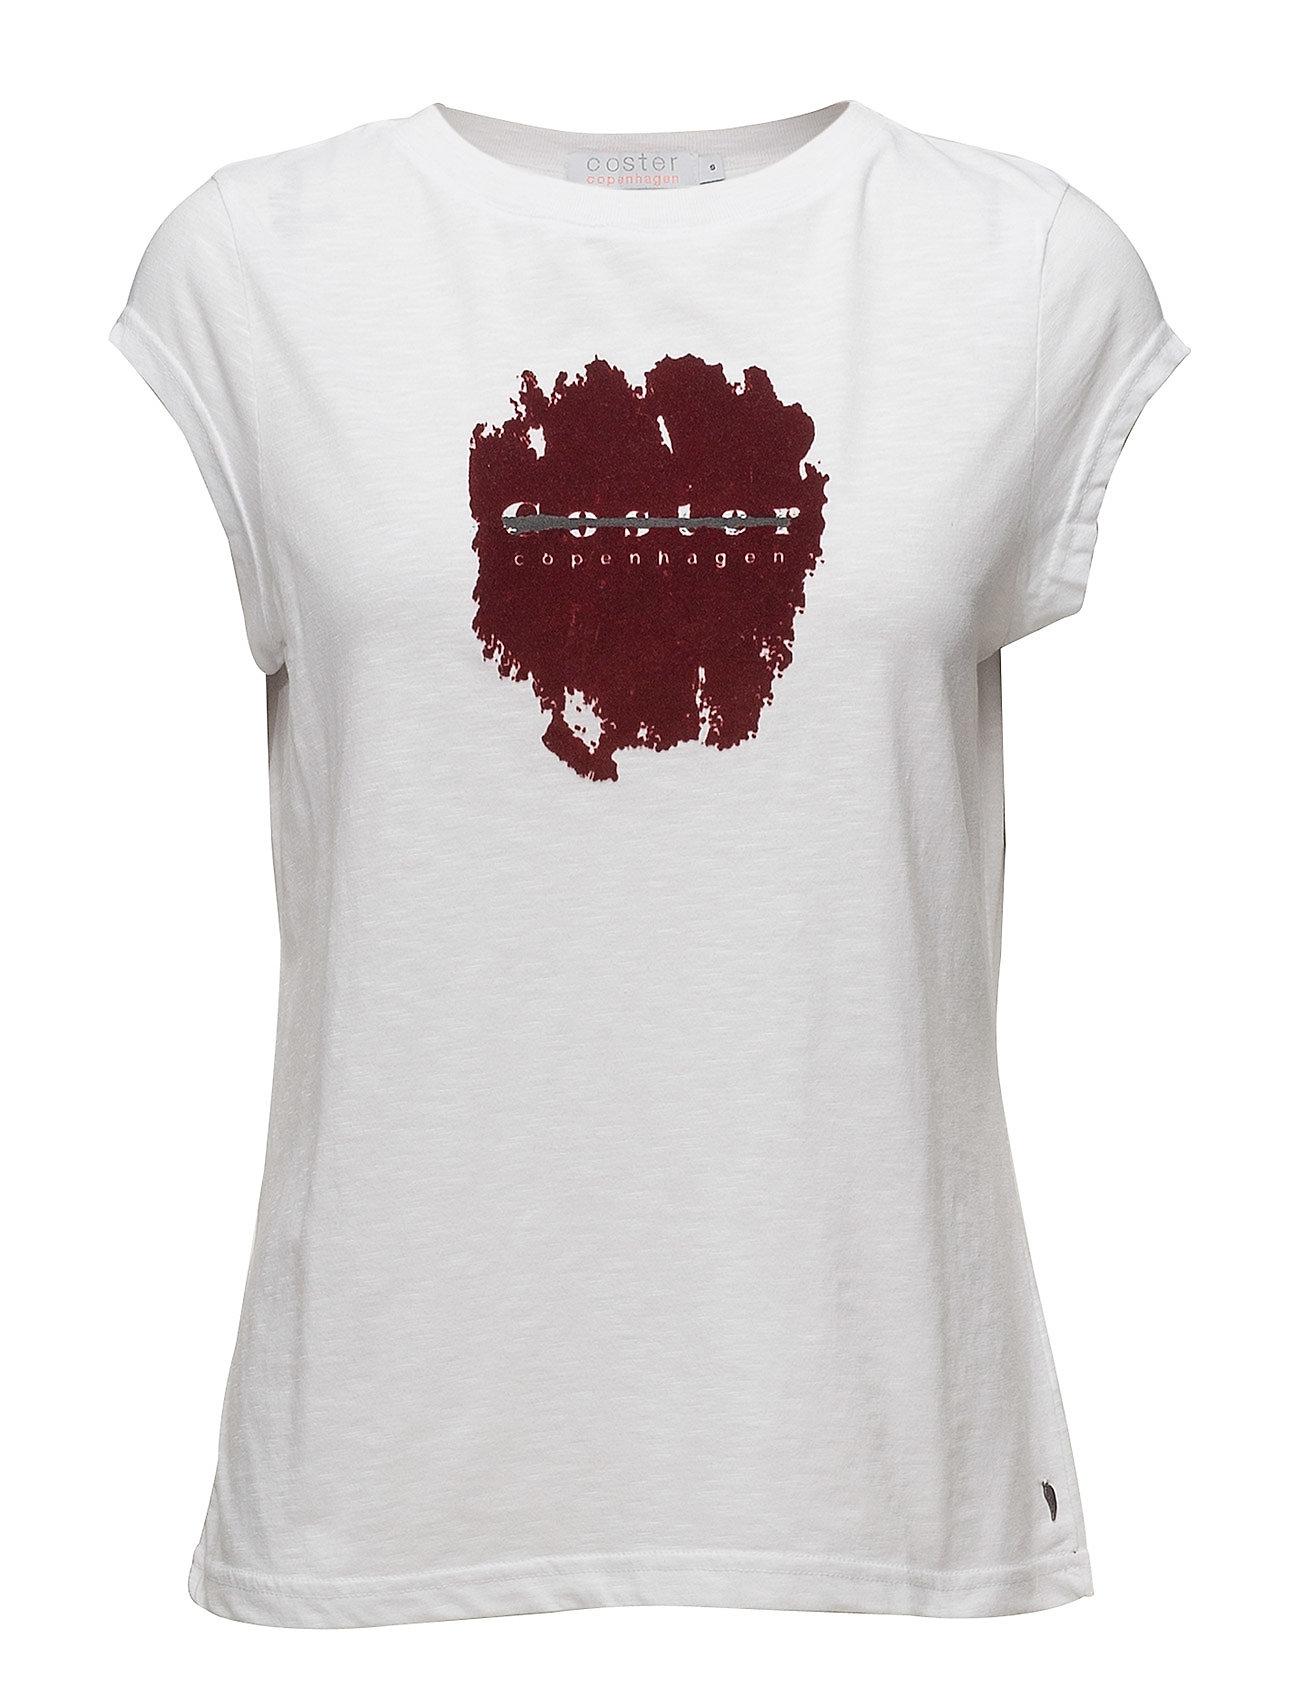 T-Shirt W. Coster In Flock - Coster Copenhagen